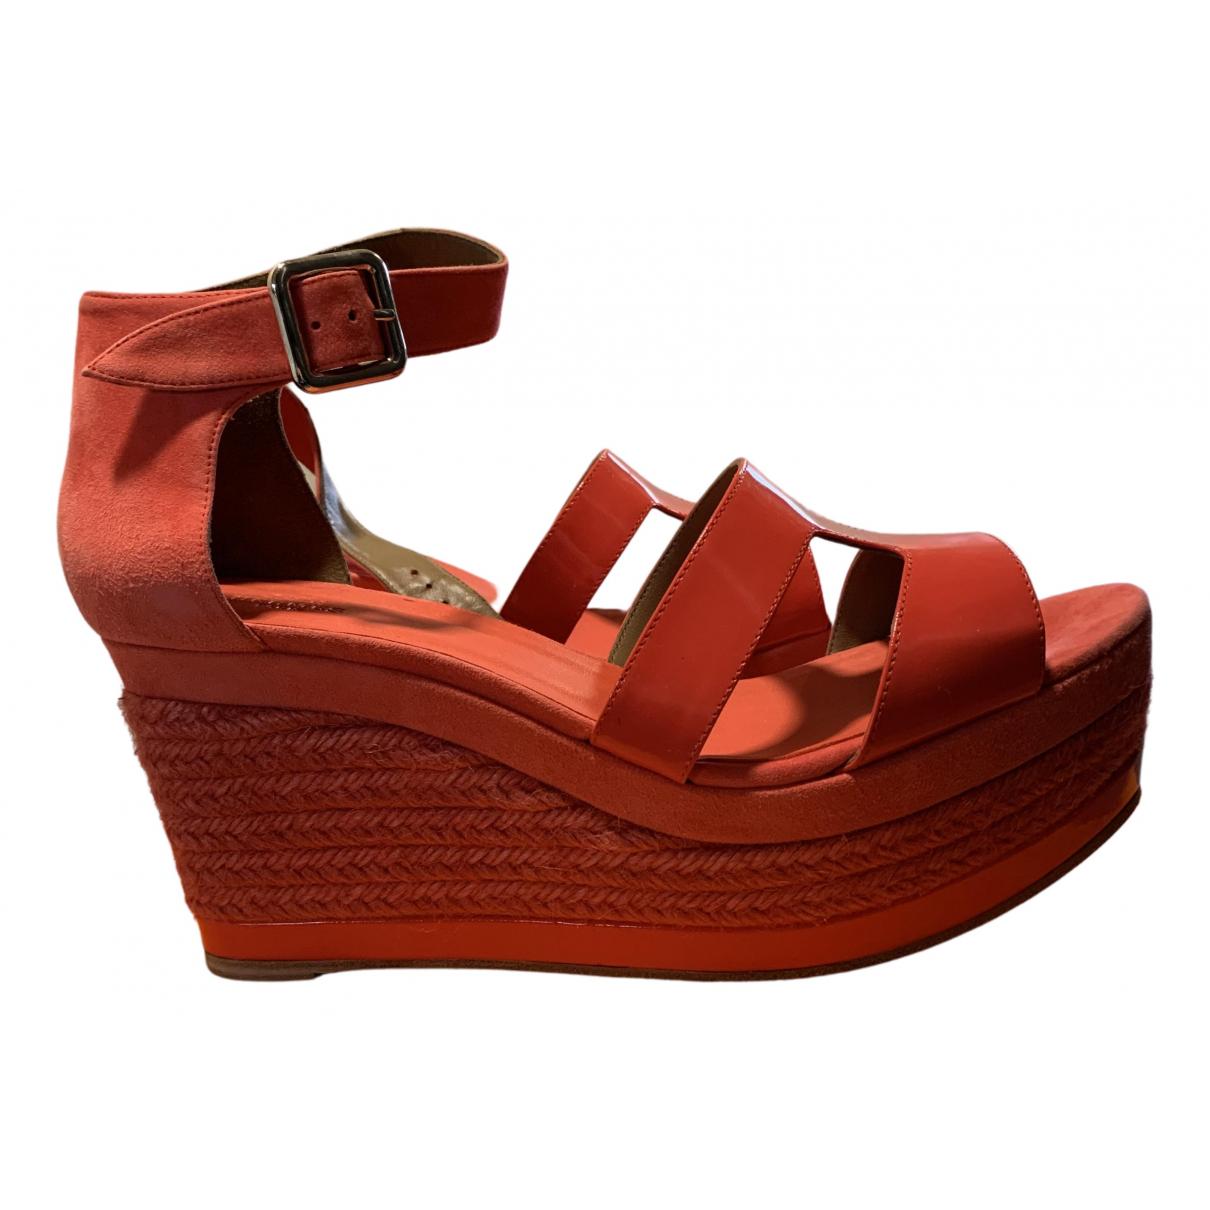 Hermes - Espadrilles Tilana pour femme en cuir verni - rose